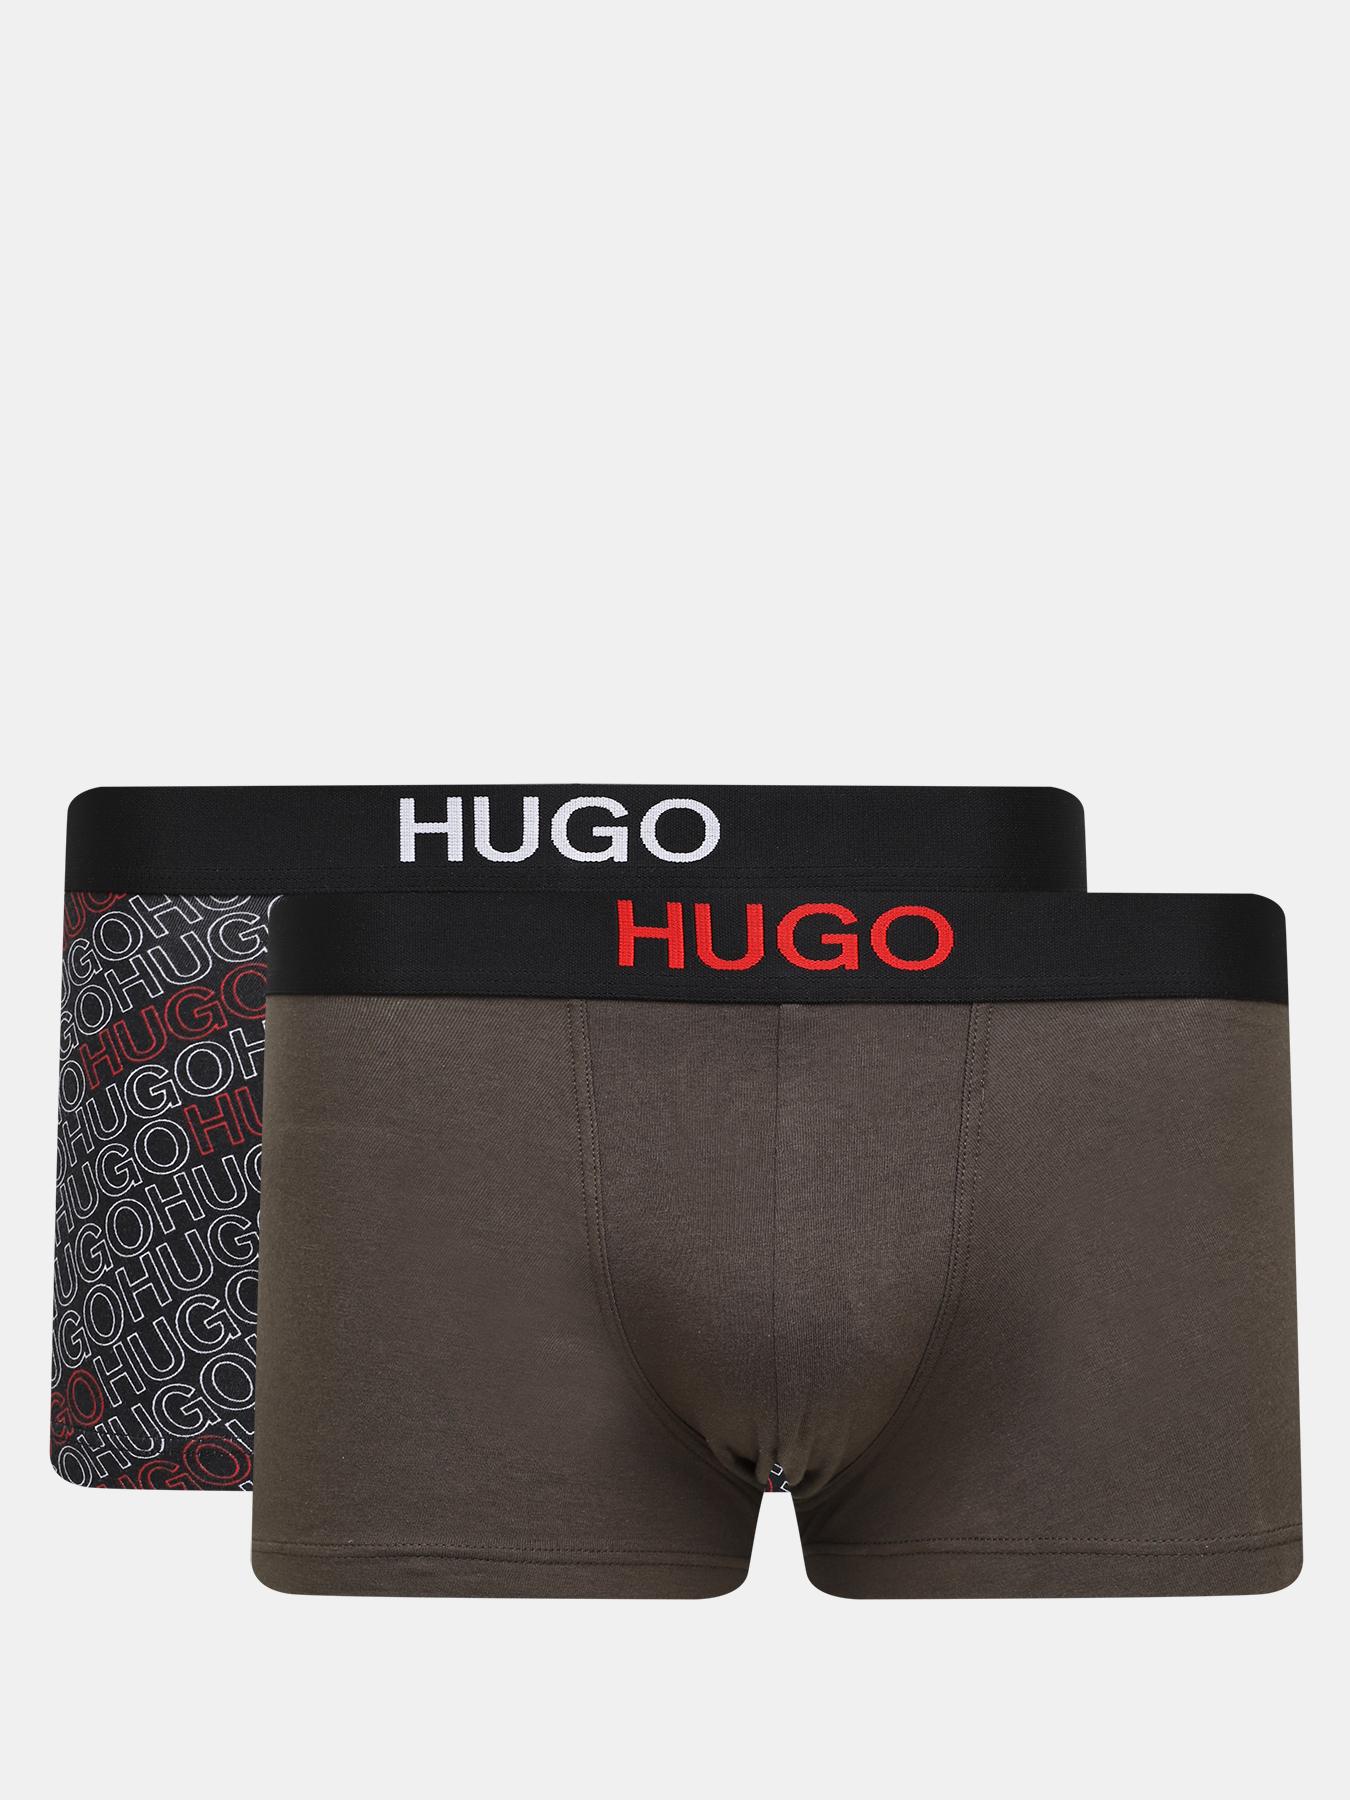 Фото - Комплекты HUGO Боксеры TRUNK BROTHER PACK (2 шт) трусы hugo мужские боксеры trunk brother 2 шт